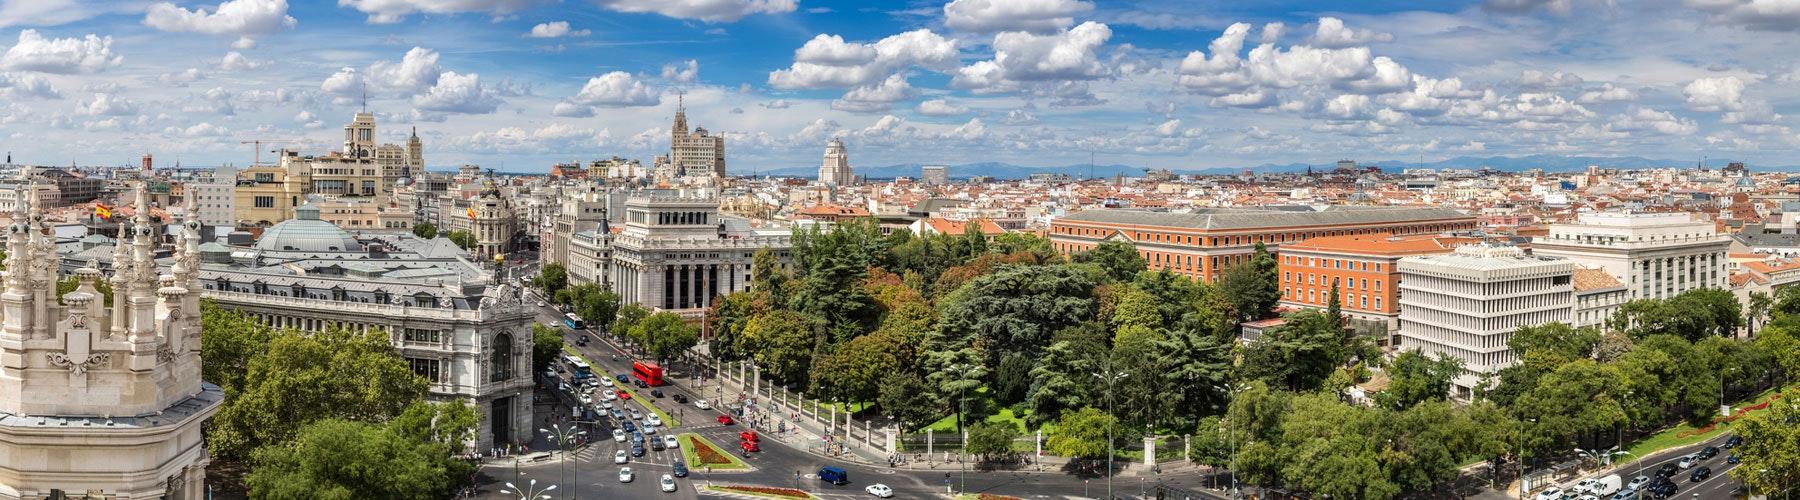 Spanien Schueleraustausch2